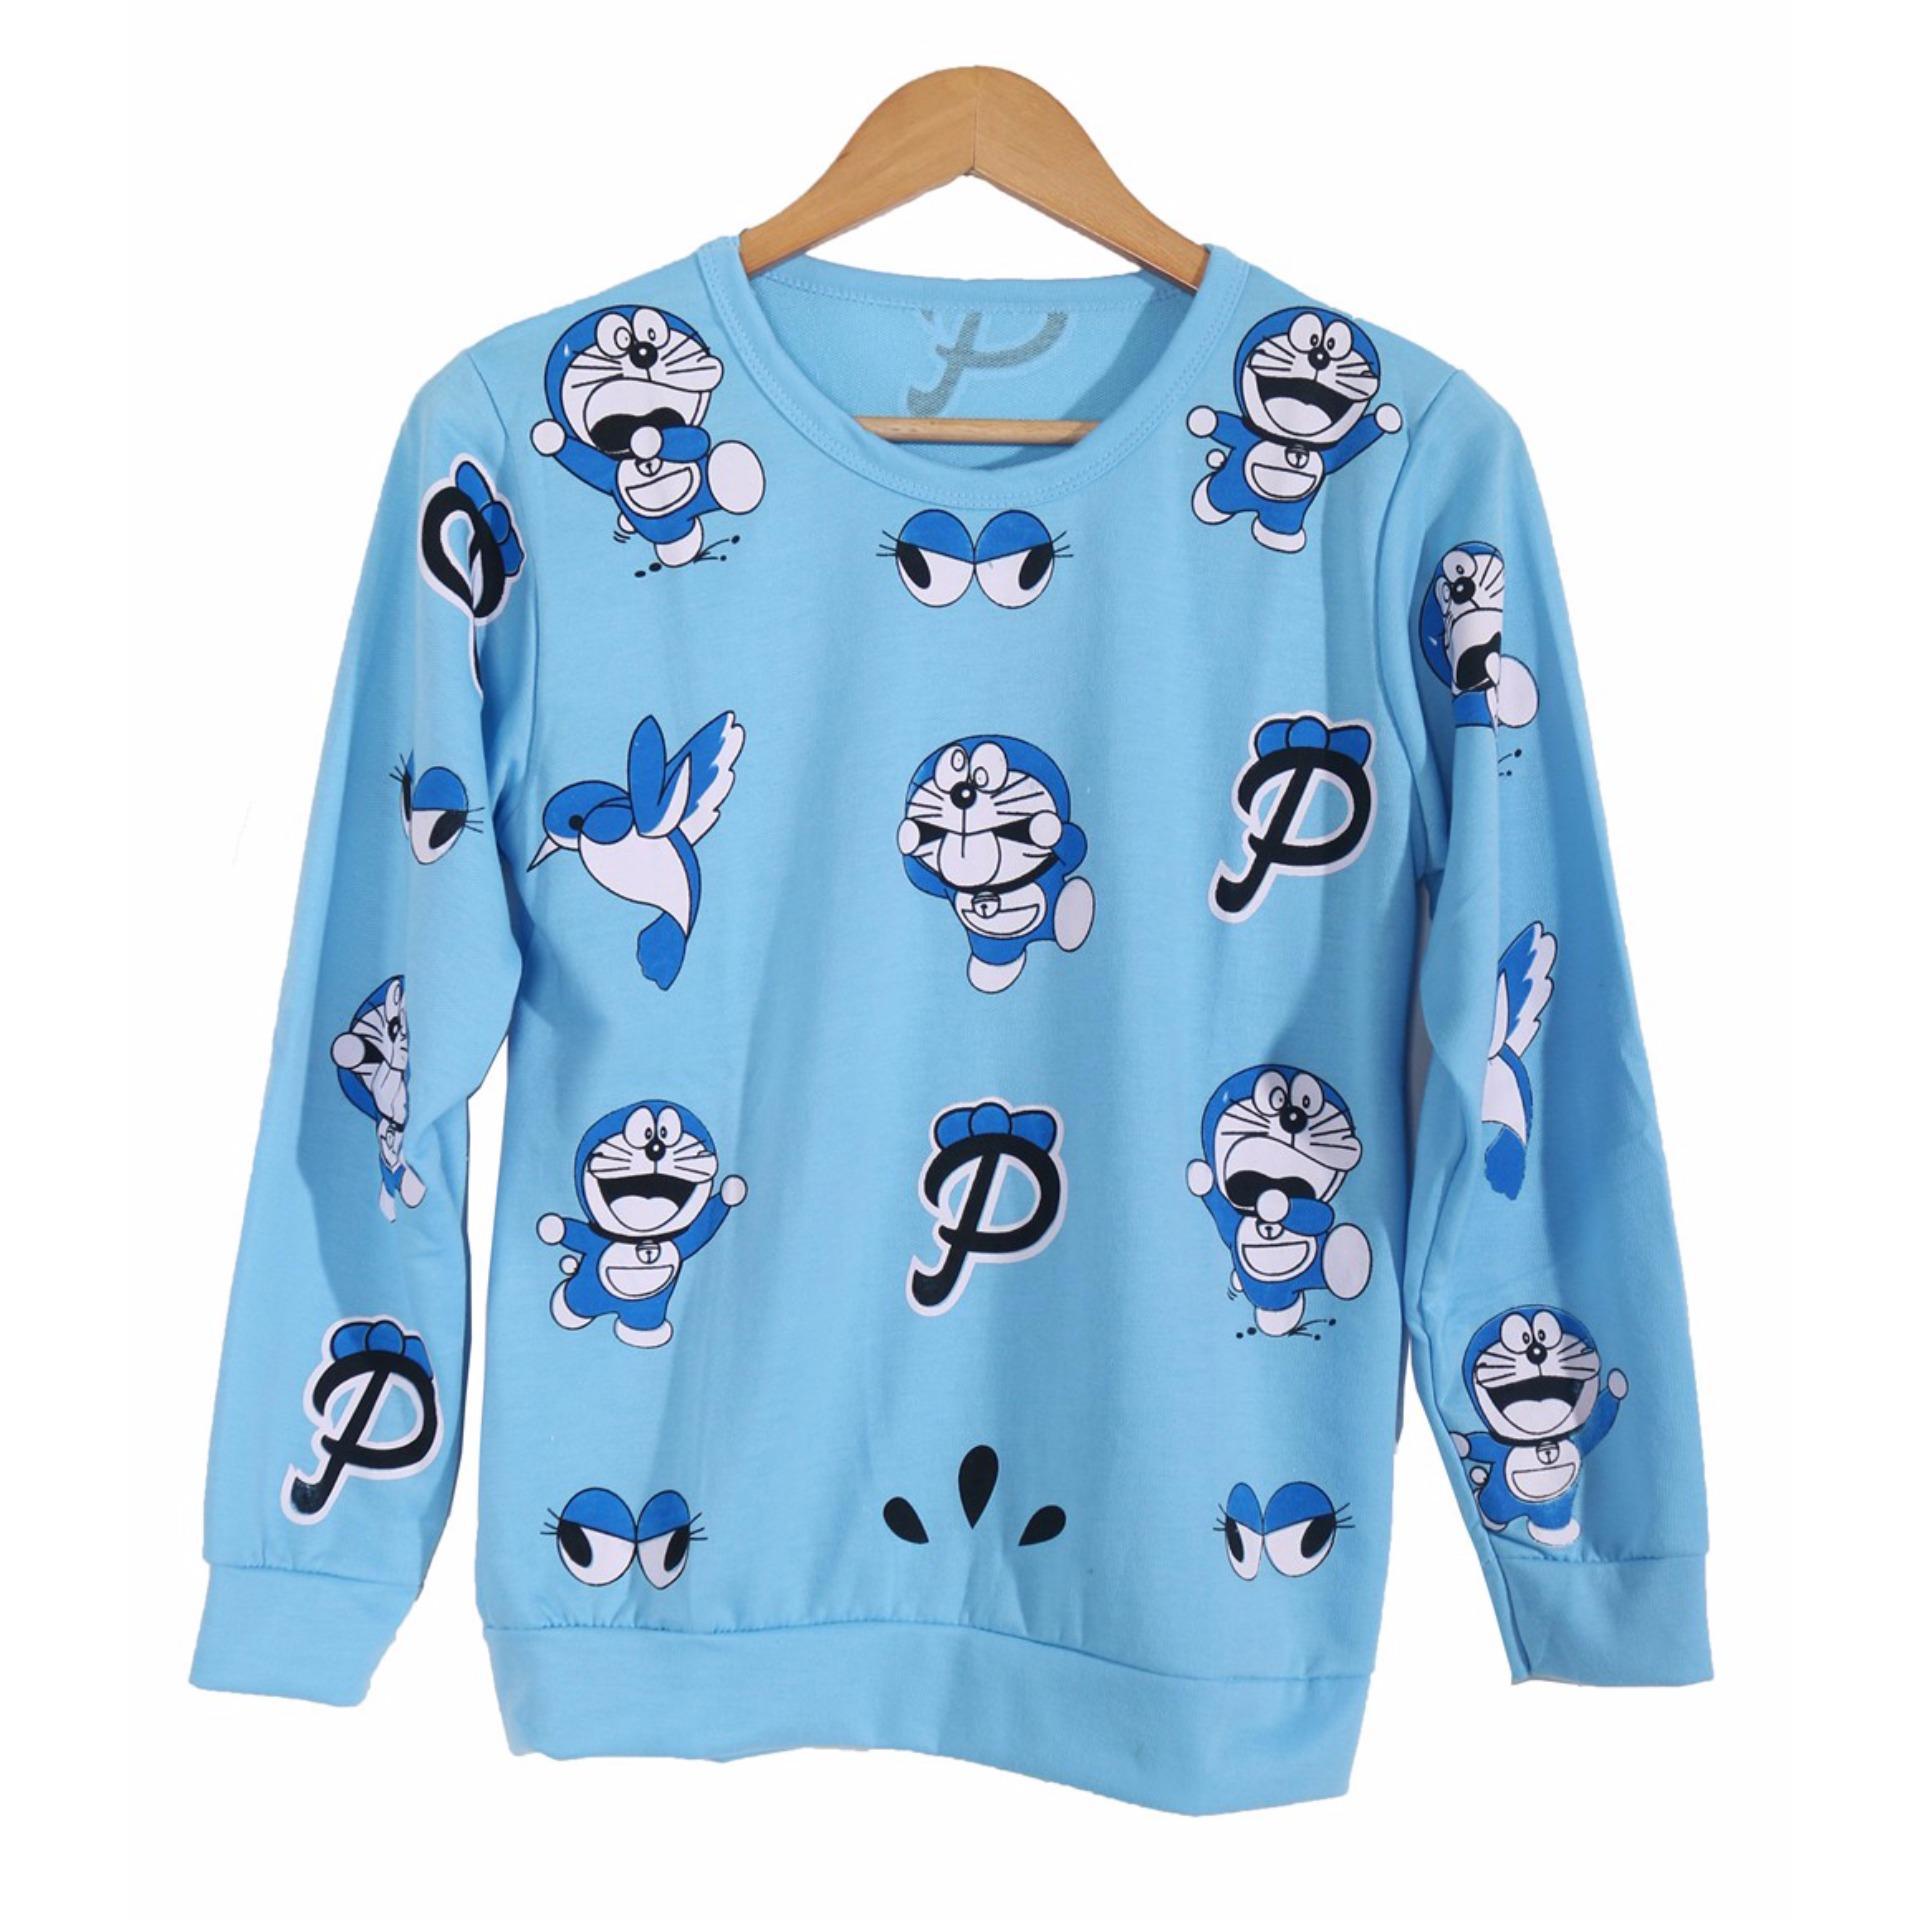 Size fit to L Cikitashop Kaos Cewe   Kaos Tumblr Tee Wanita   Kaos T-Shirt  Wanita   Kaos cd5277355b